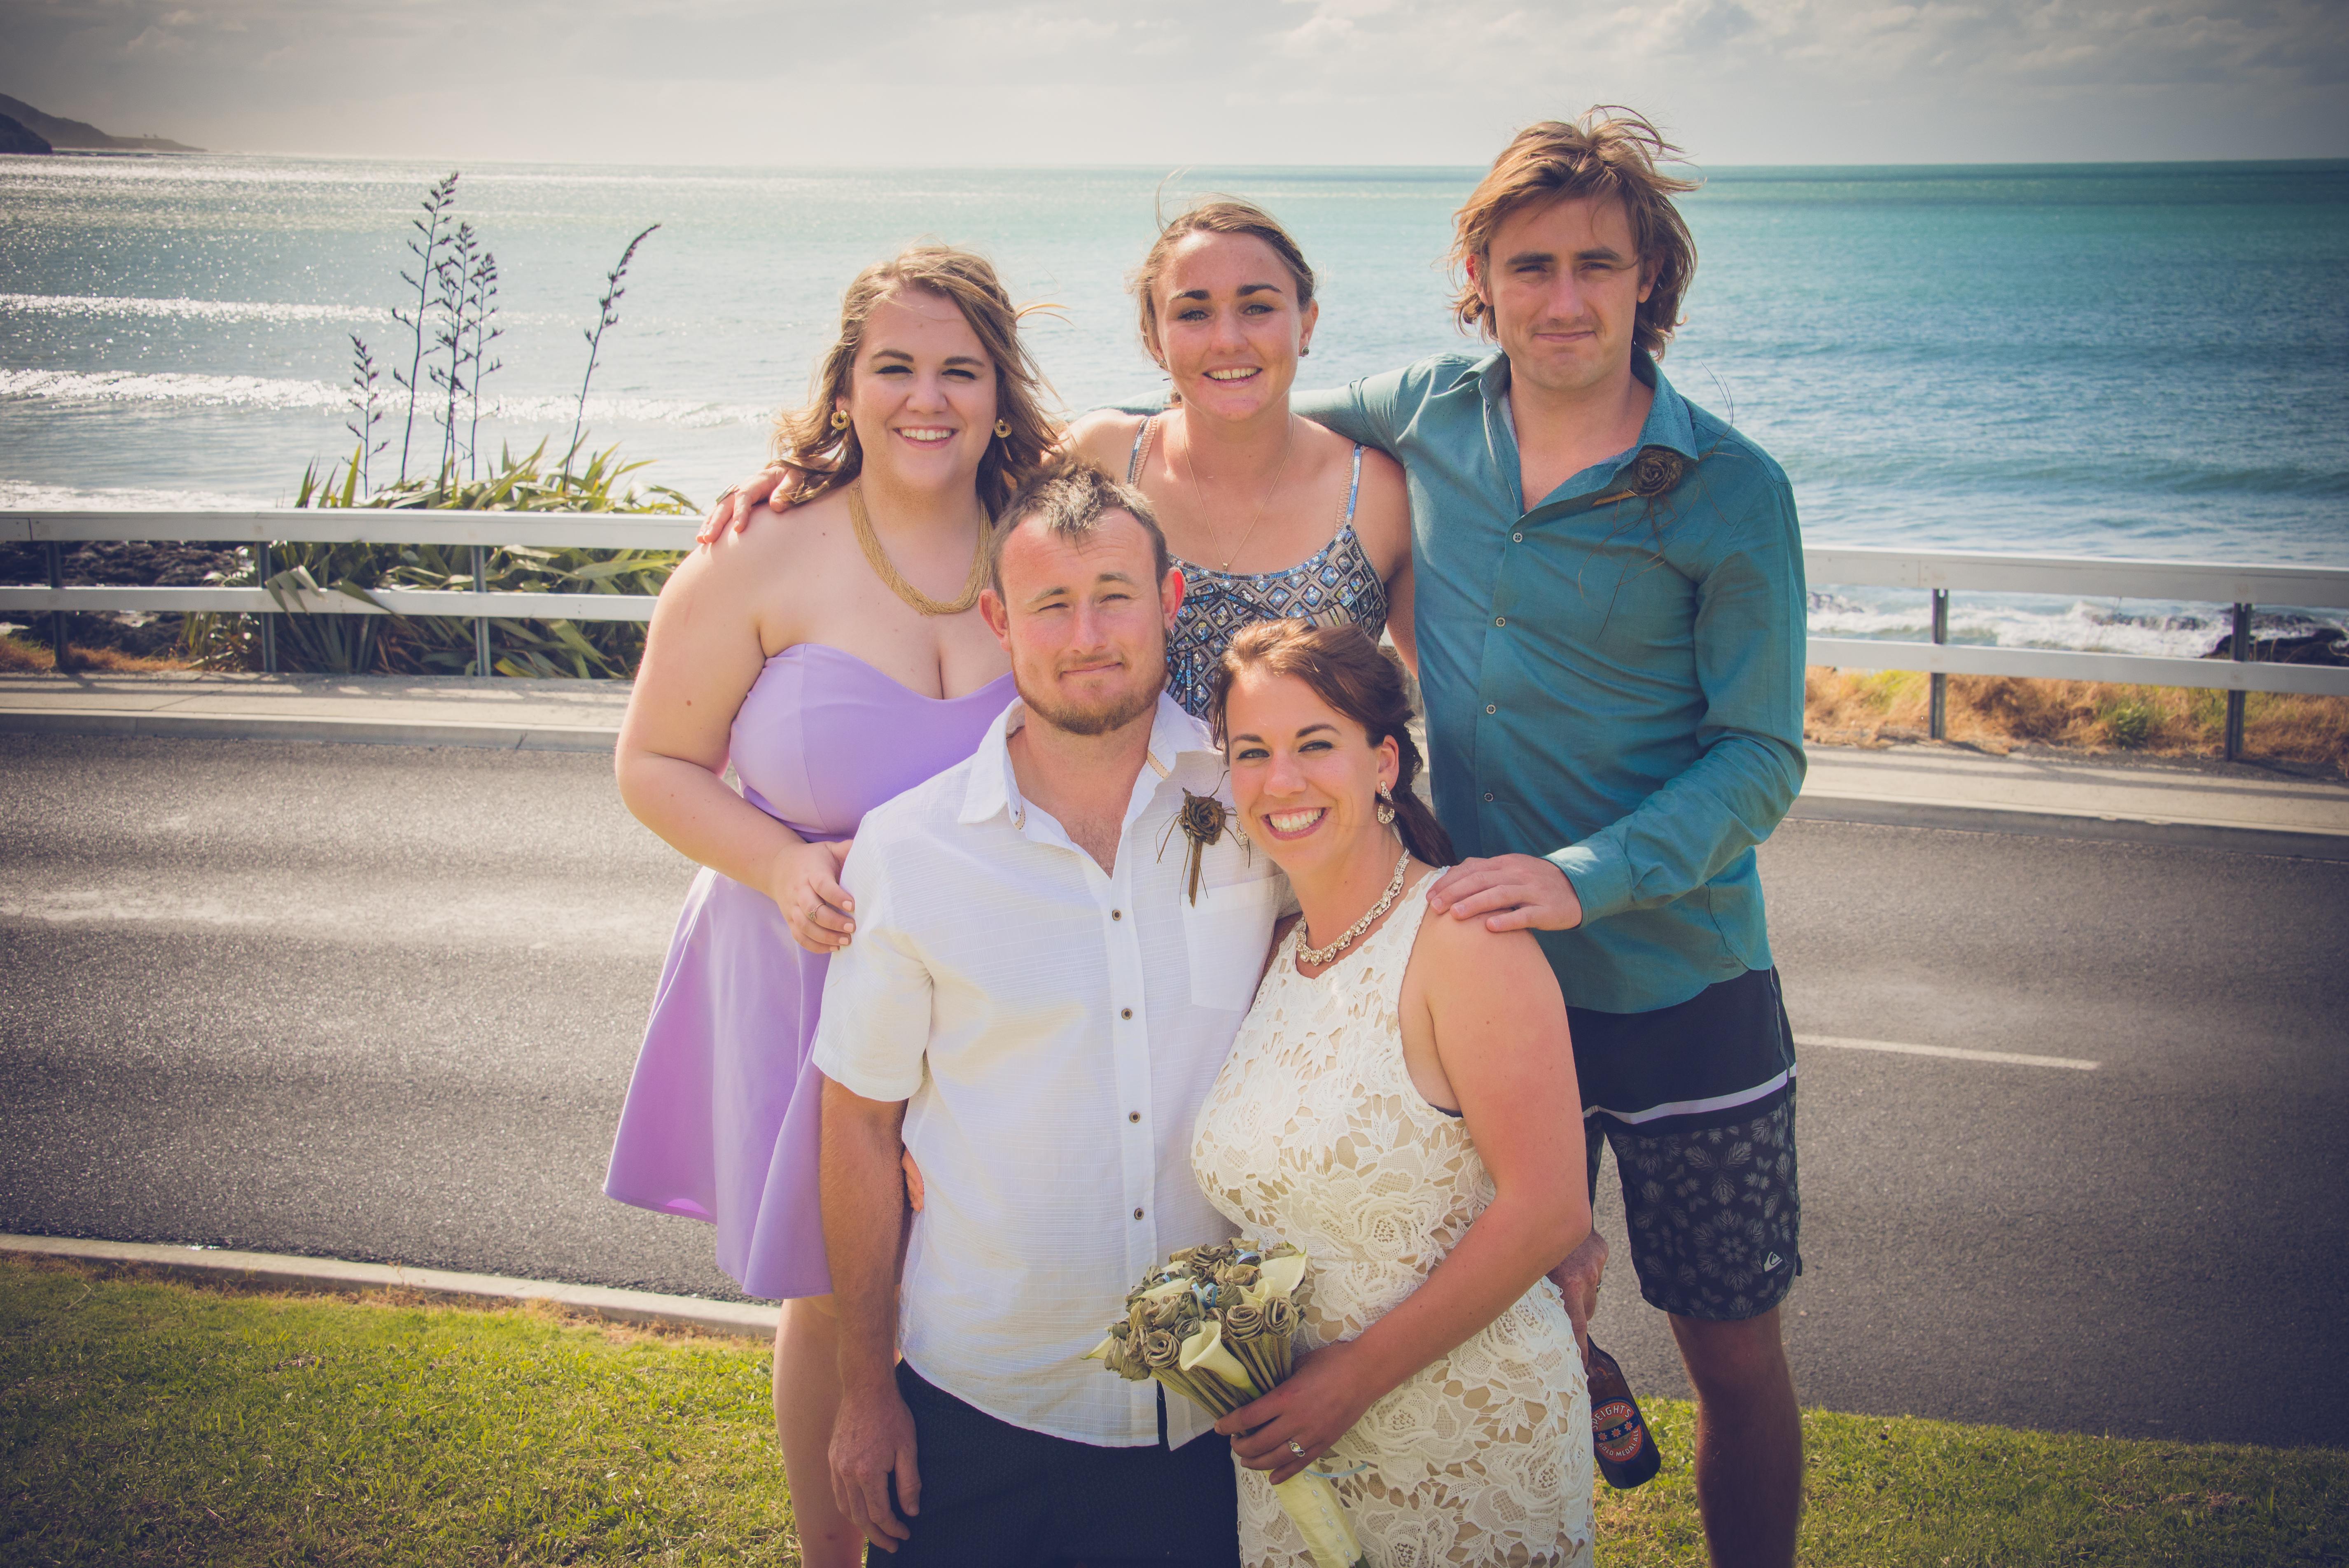 NEW ZEALAND BEACH WEDDING